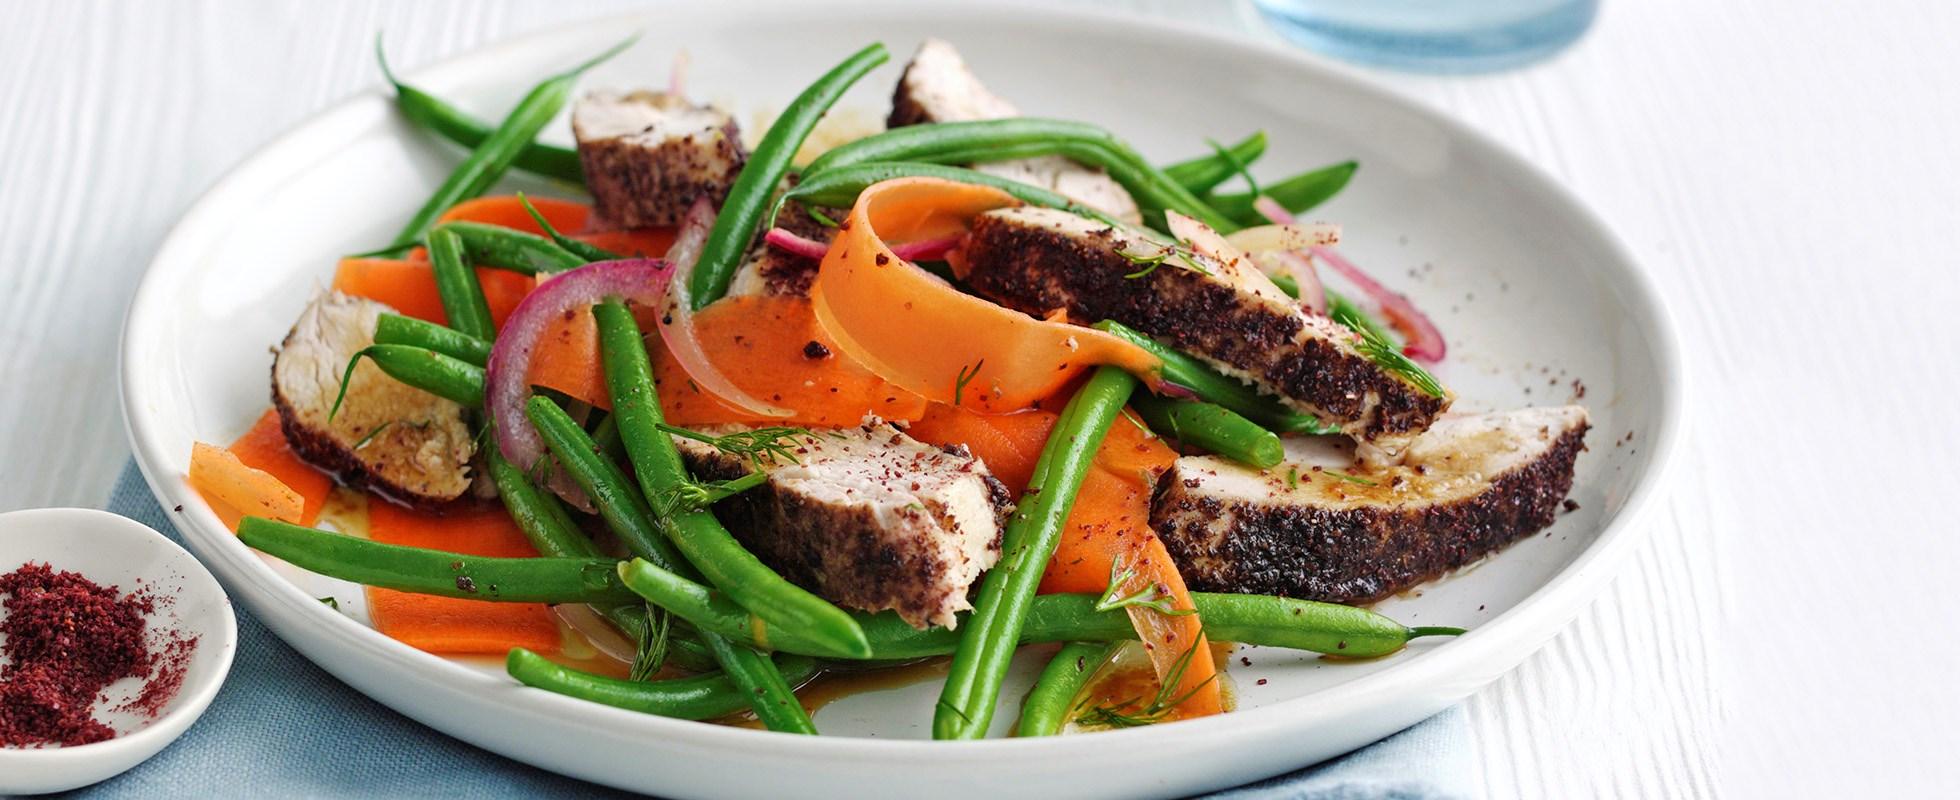 Sumac chicken and green bean salad